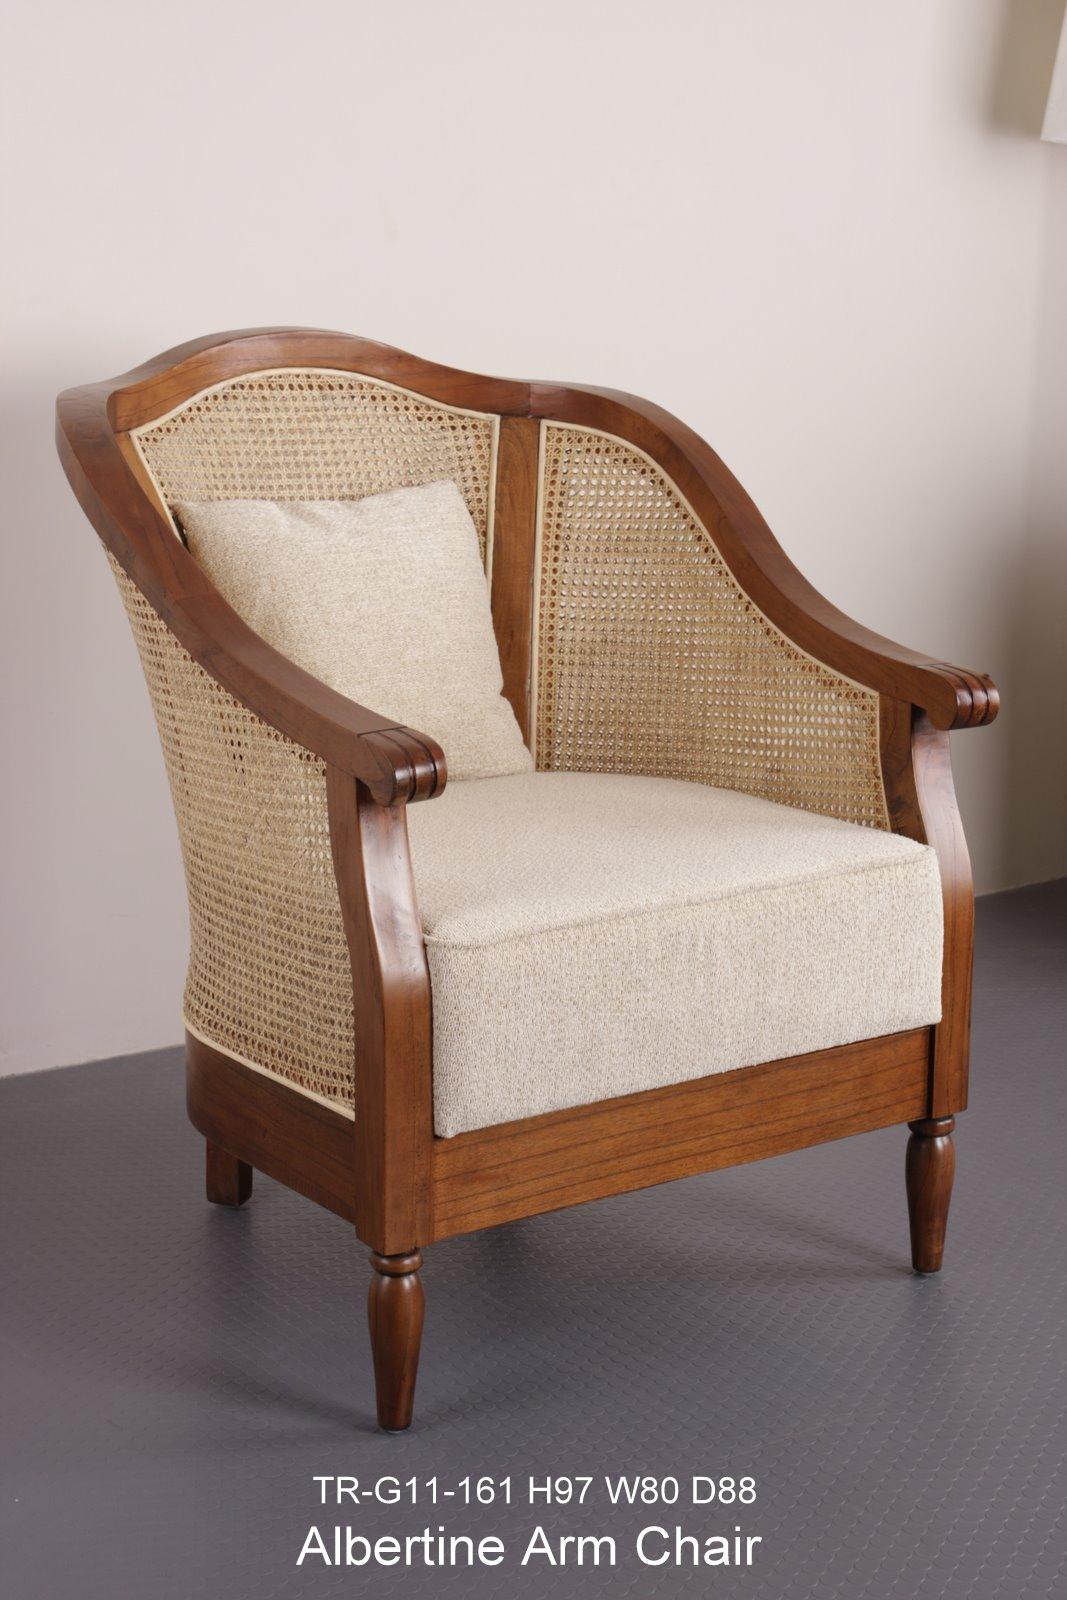 Albertine Arm Chair.jpg